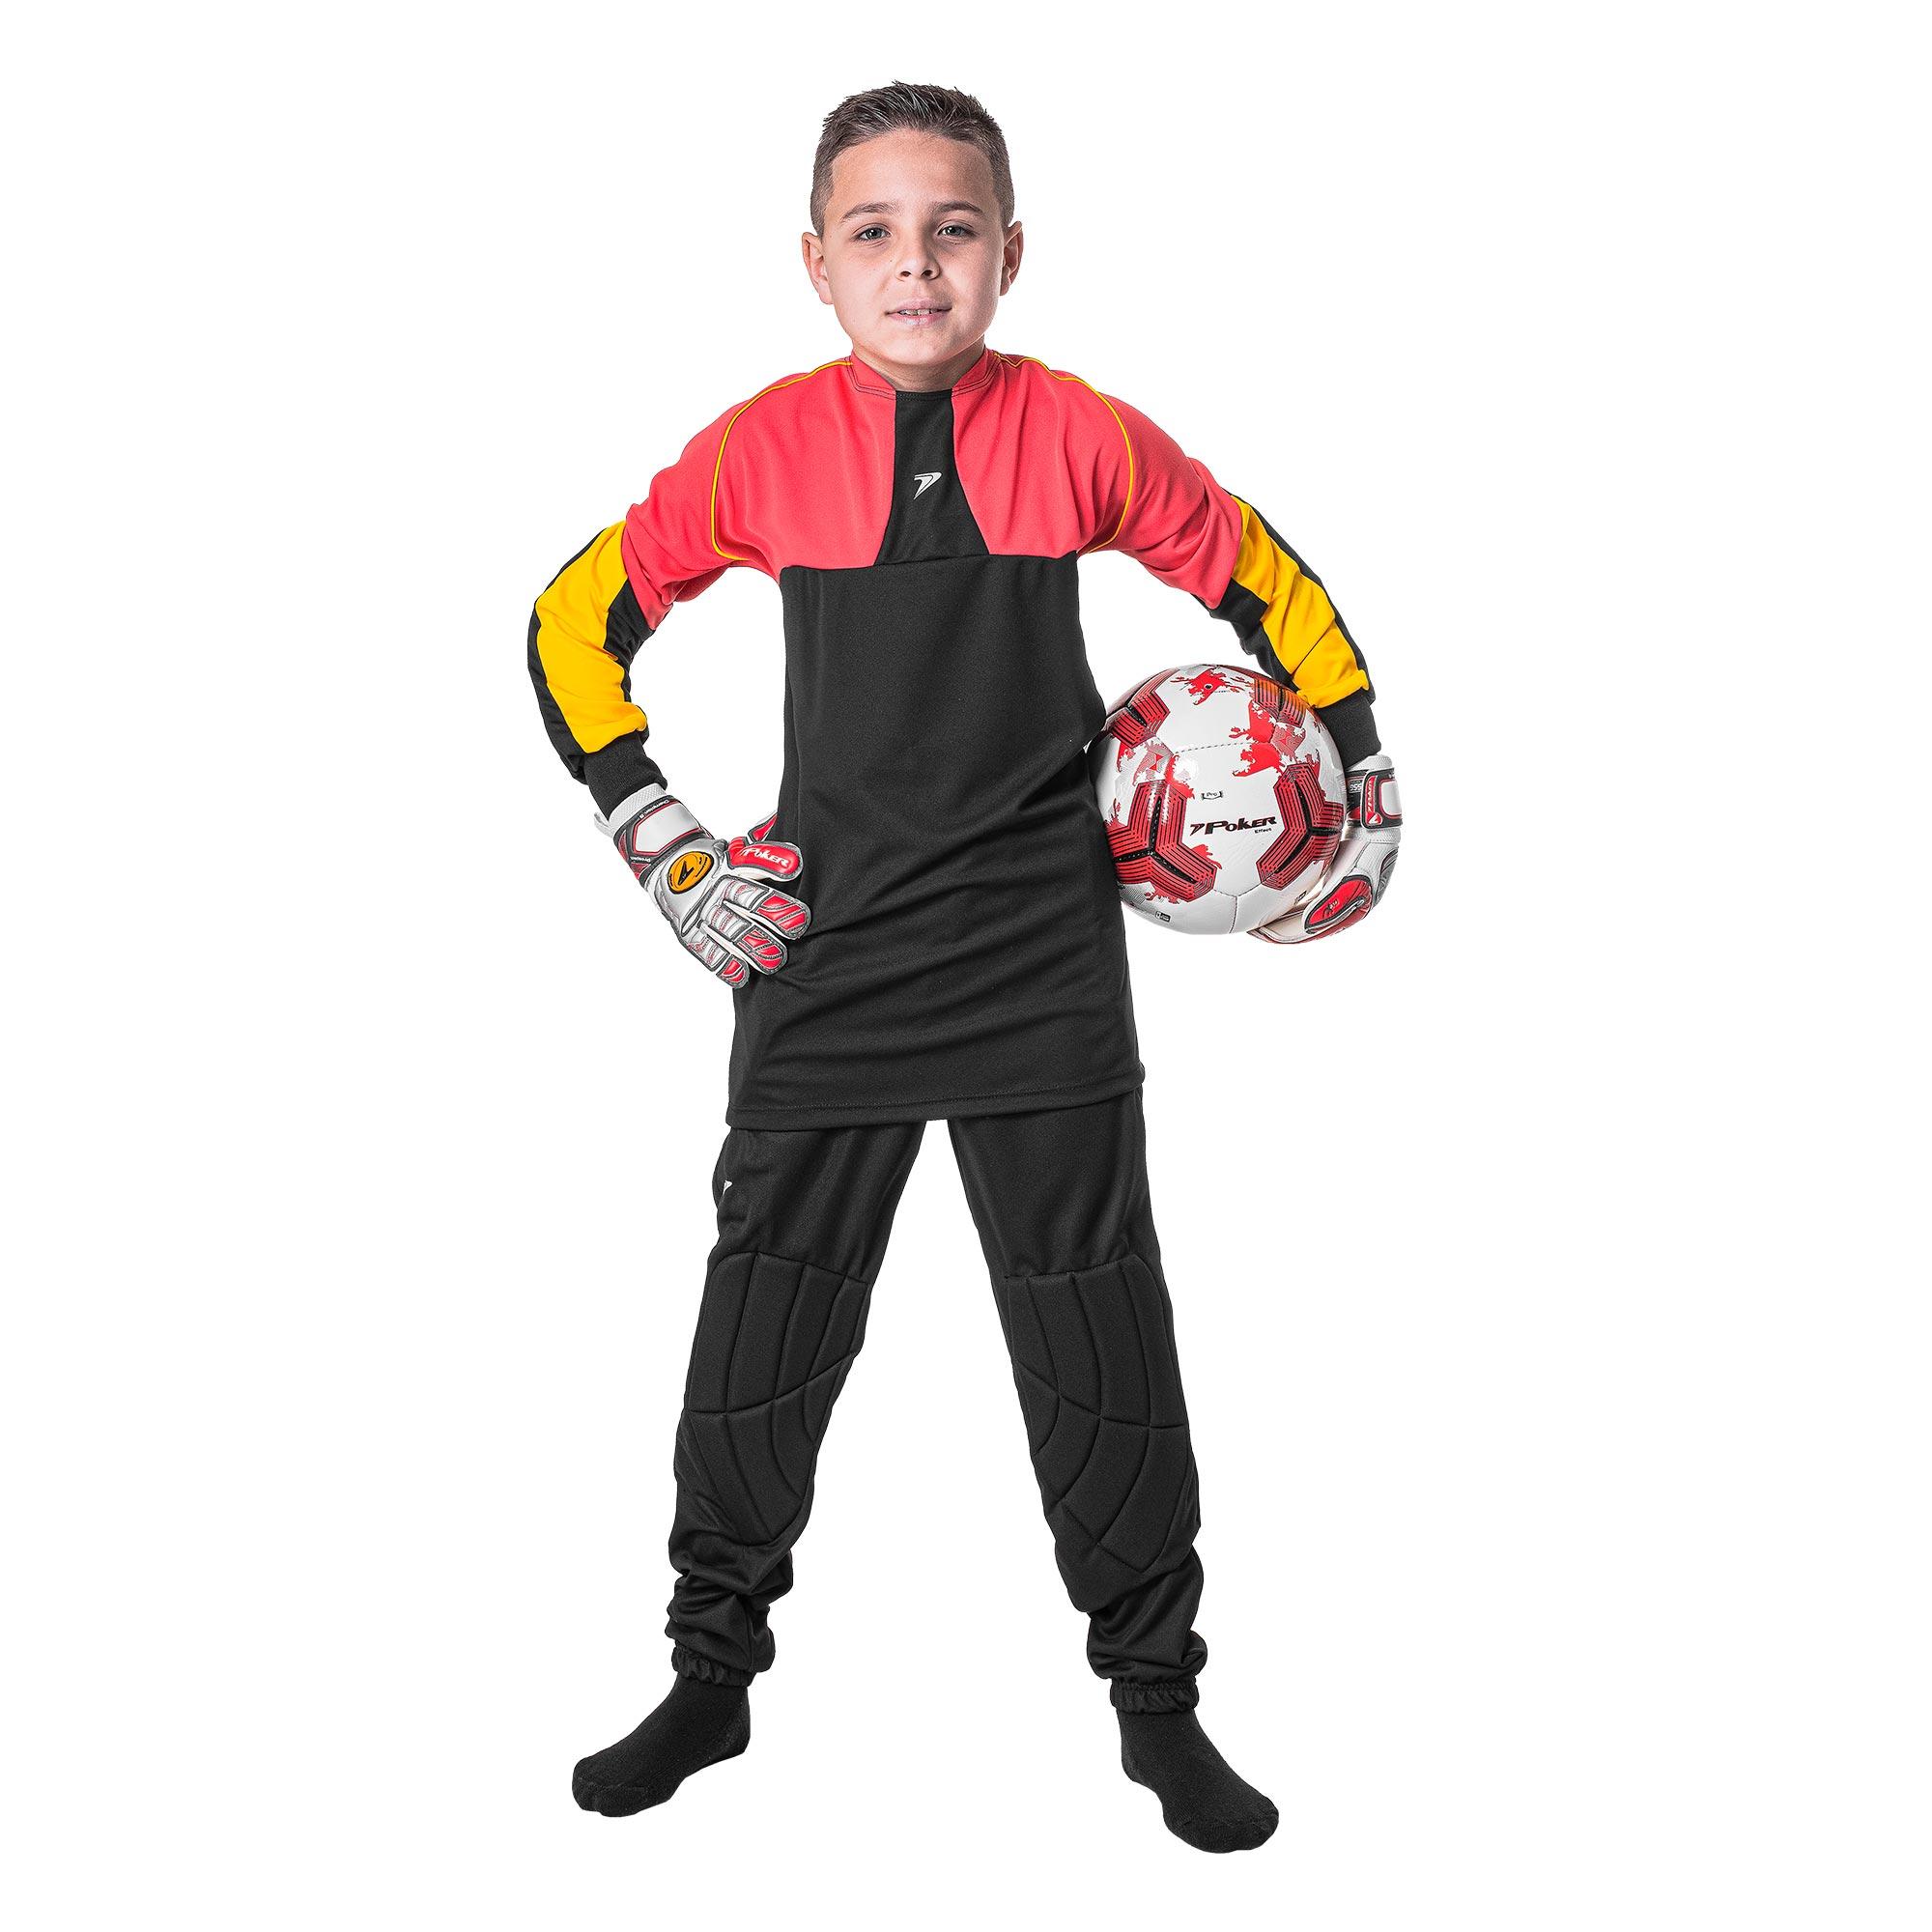 Conjunto Gol M/L Infantil Fort (Camisa + Calça+ Meia) 04157